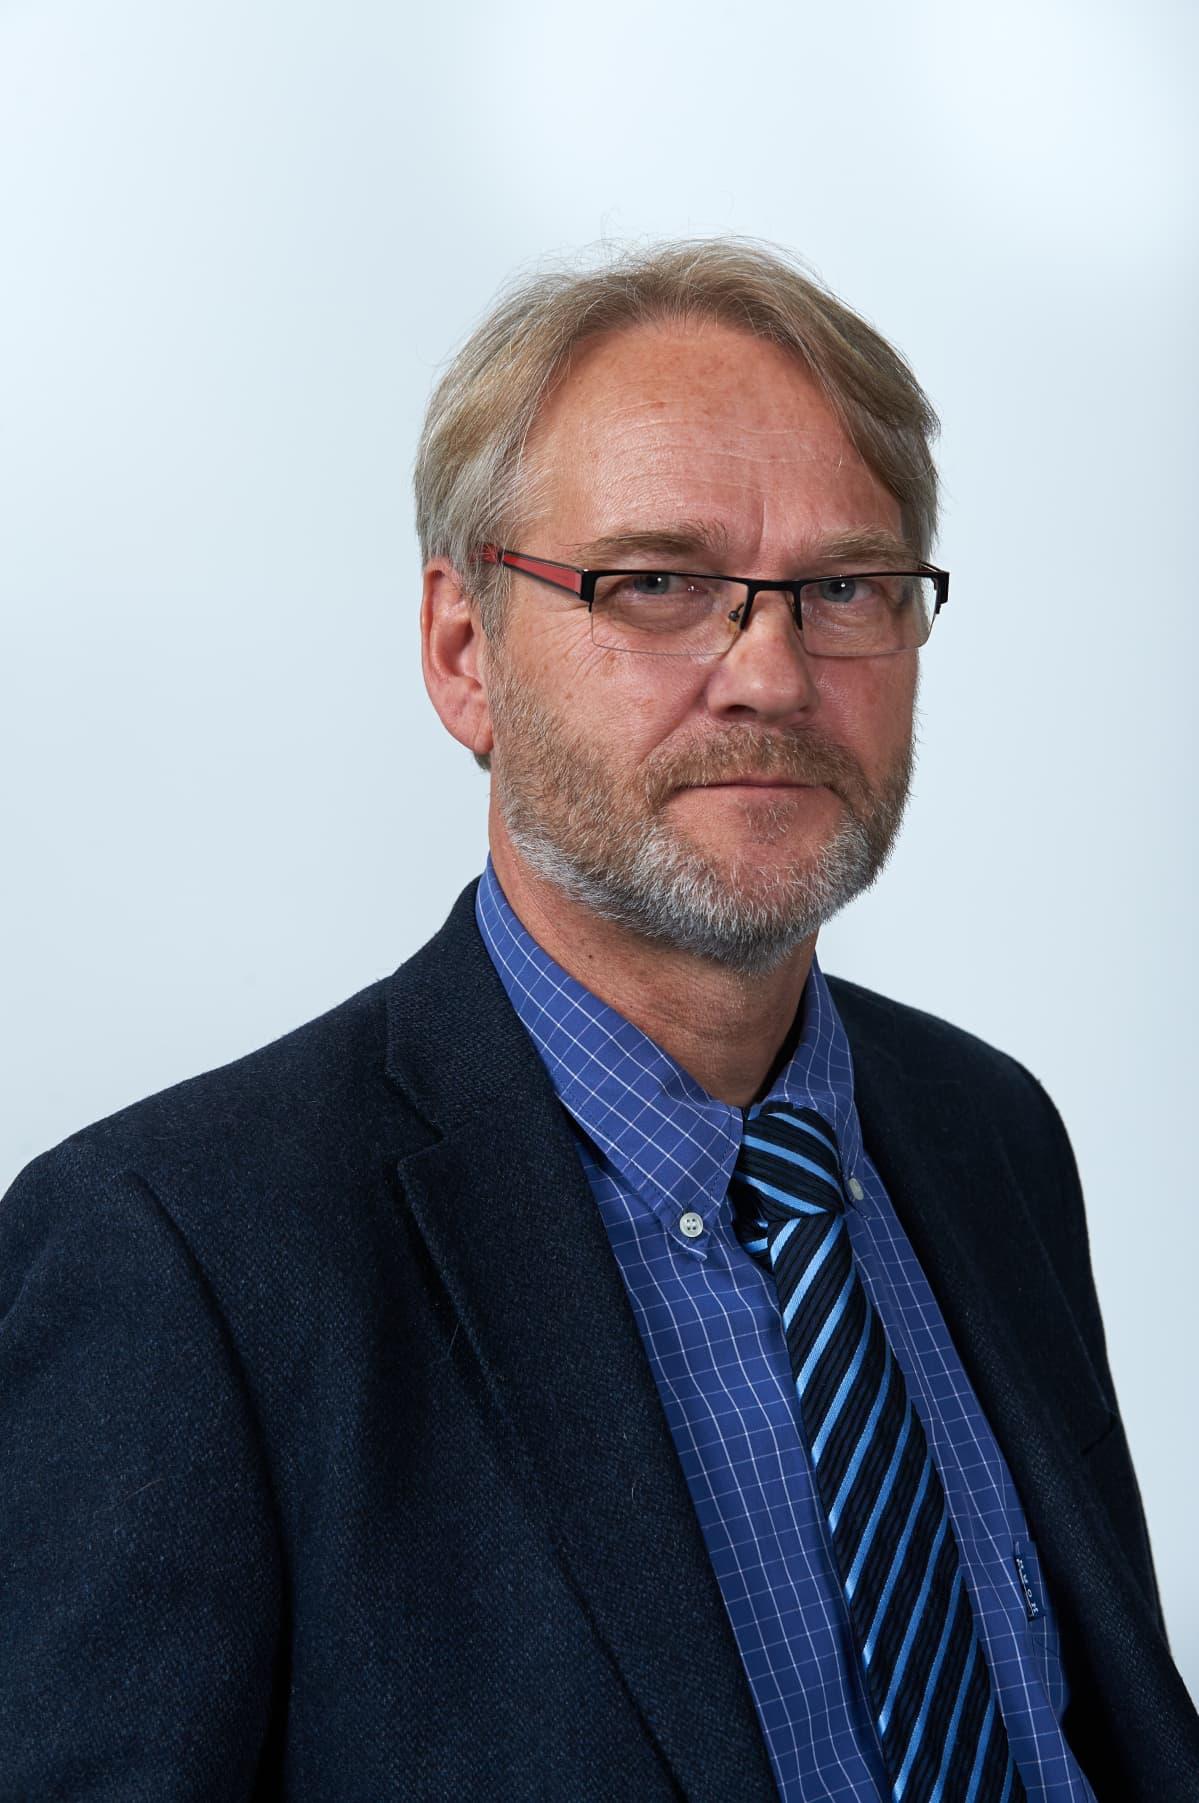 Timo Seppänen